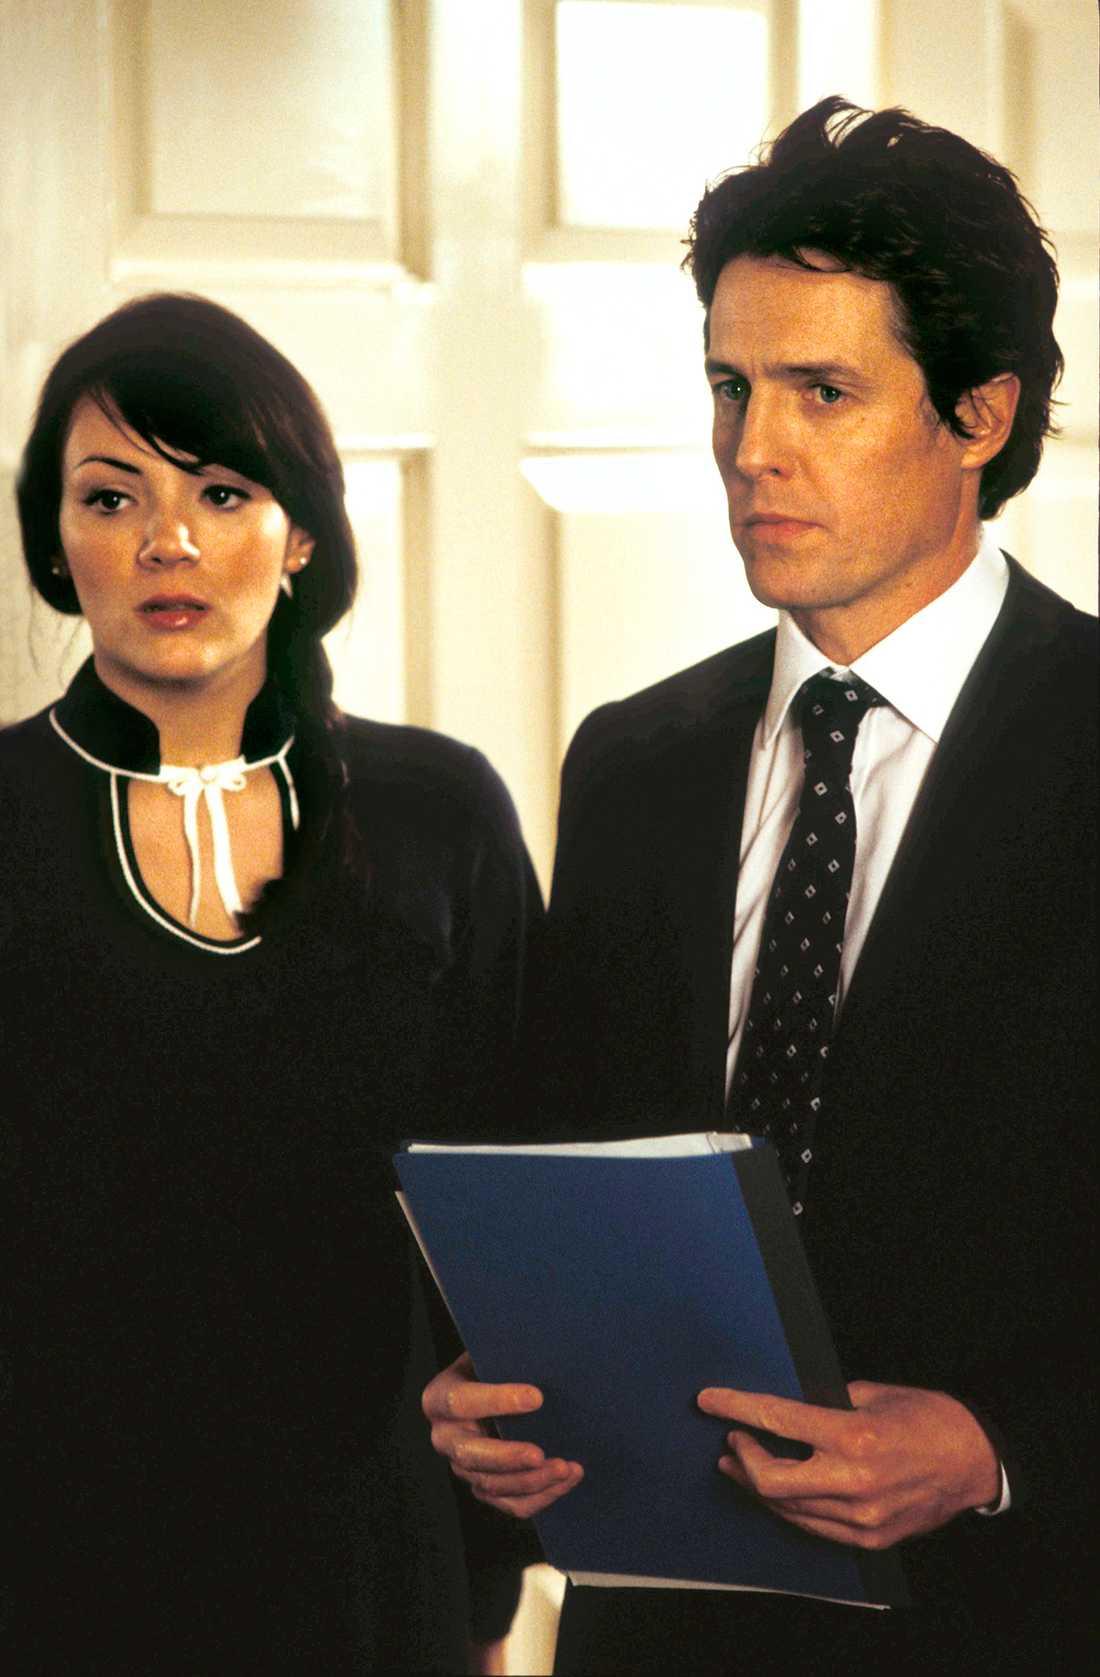 Martine Mccutcheon och Hugh Grant.